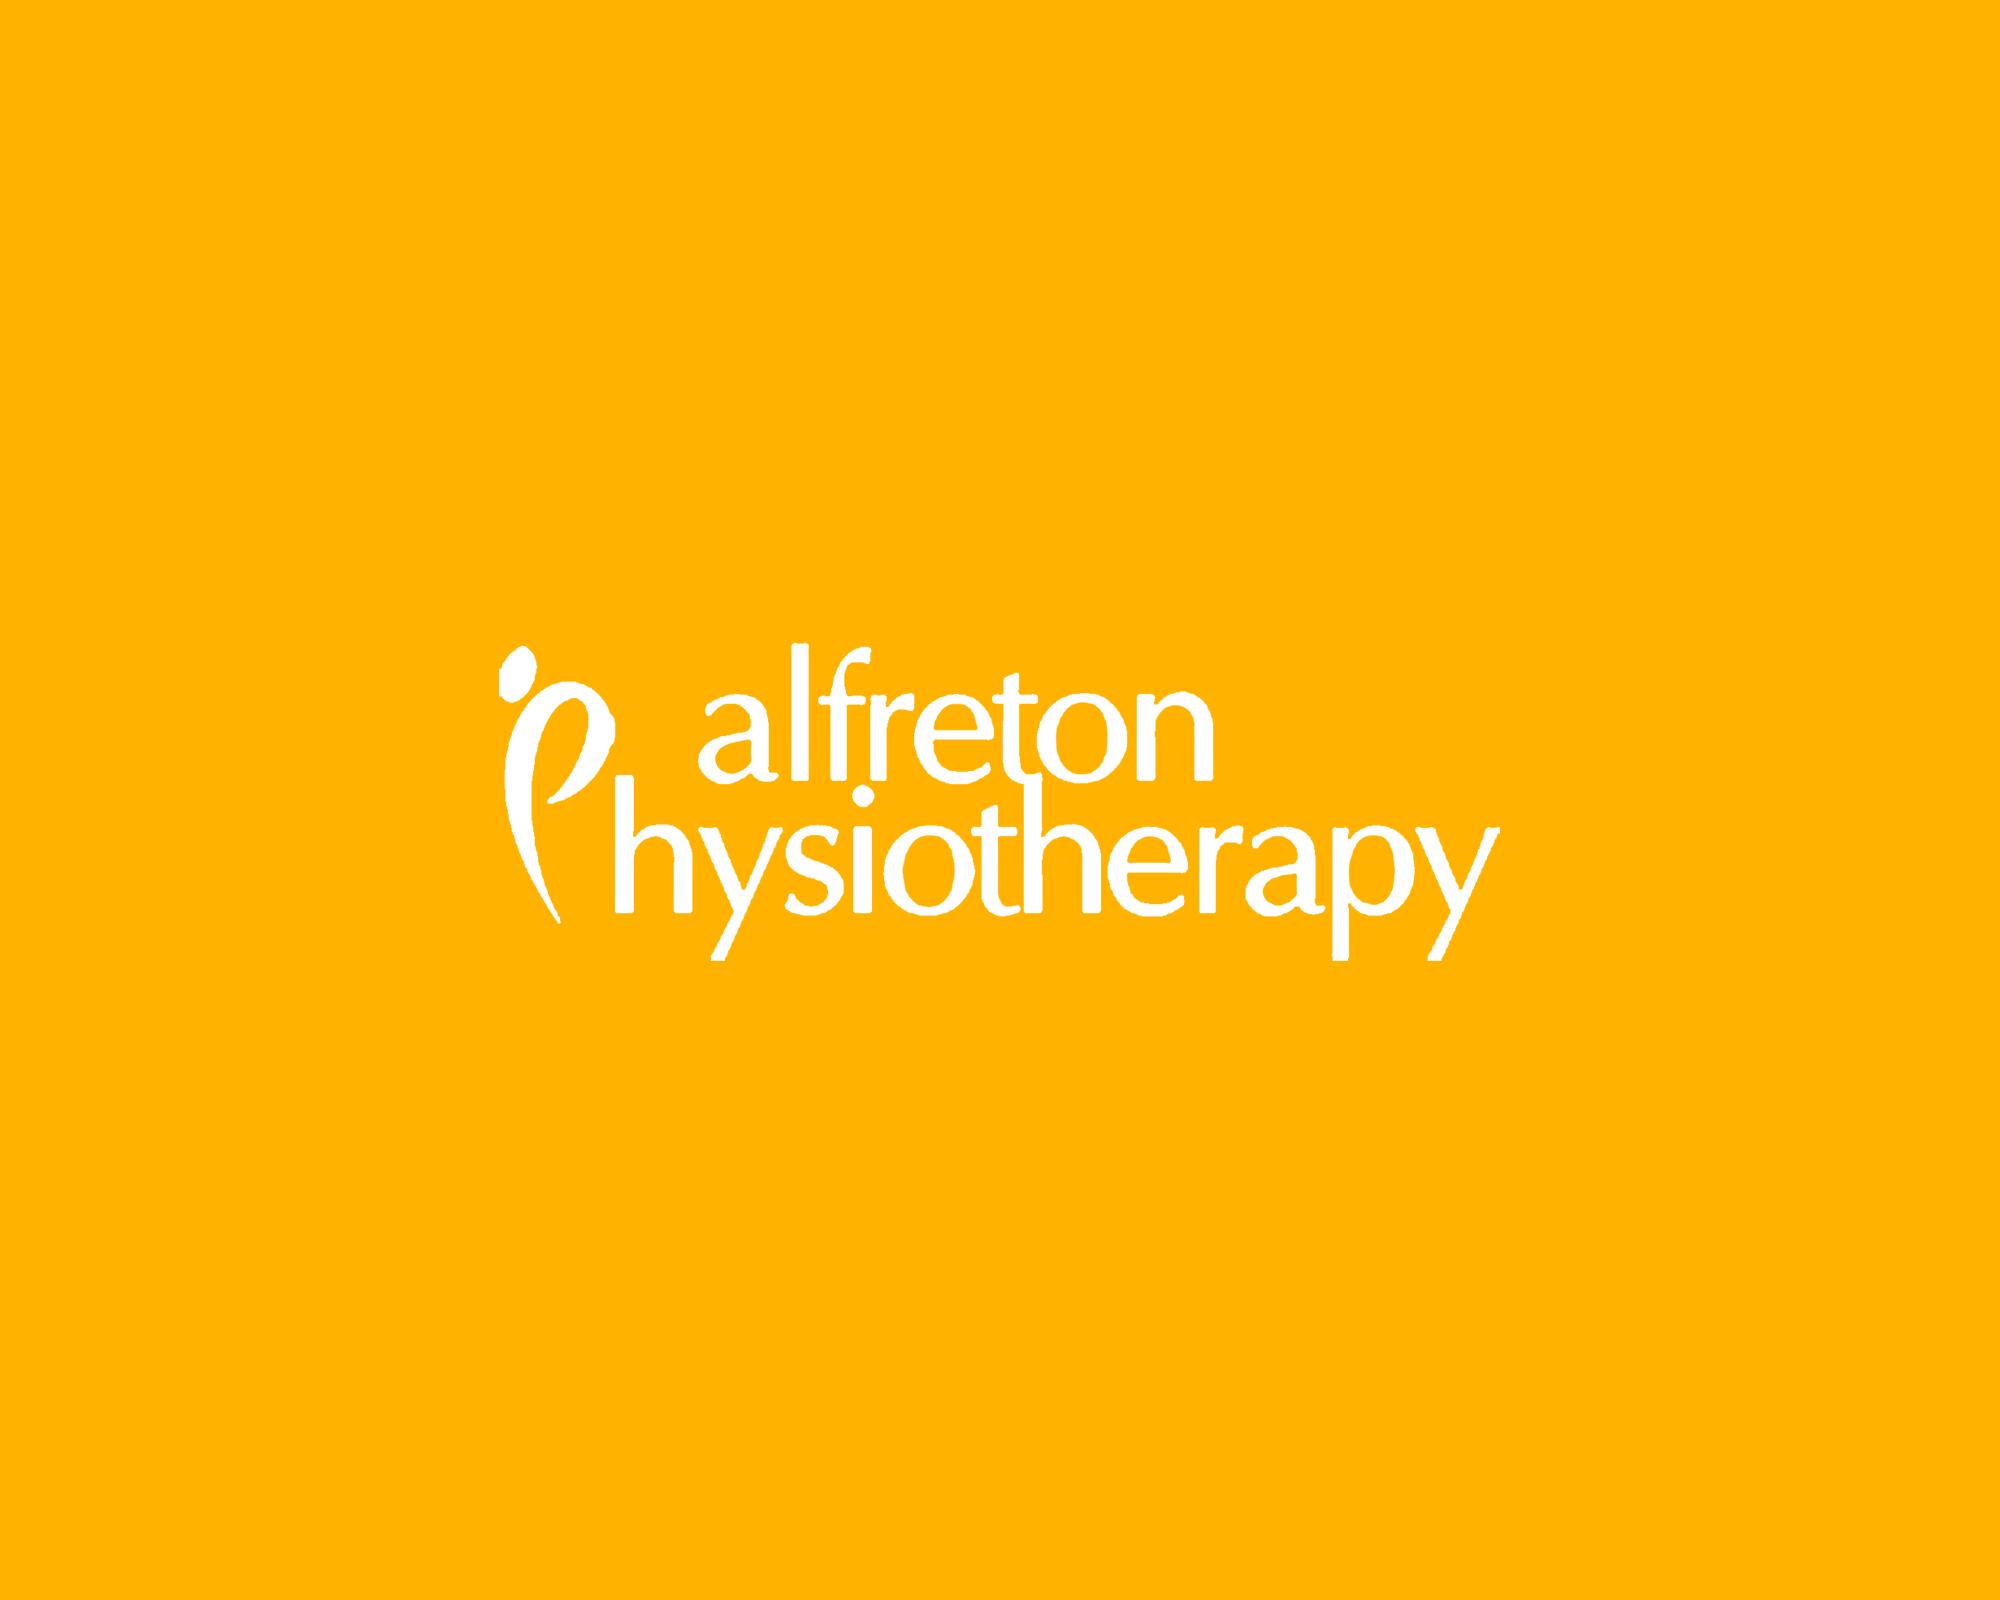 alfreton physio Logo